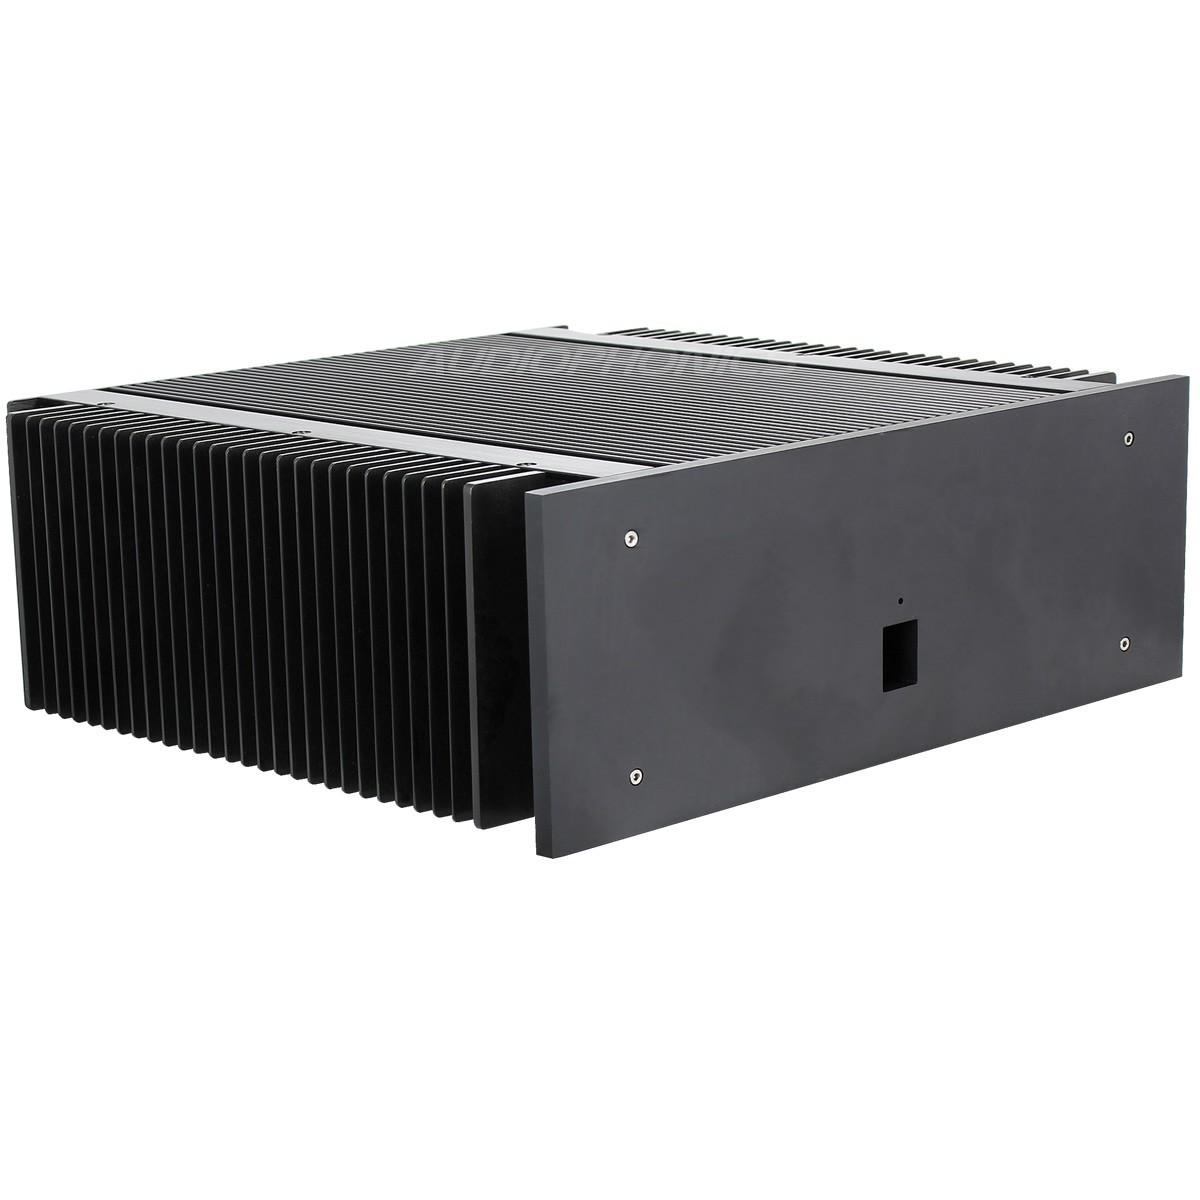 Boitier DIY Amplificateur de Puissance 100% Aluminium 400x374x150mm